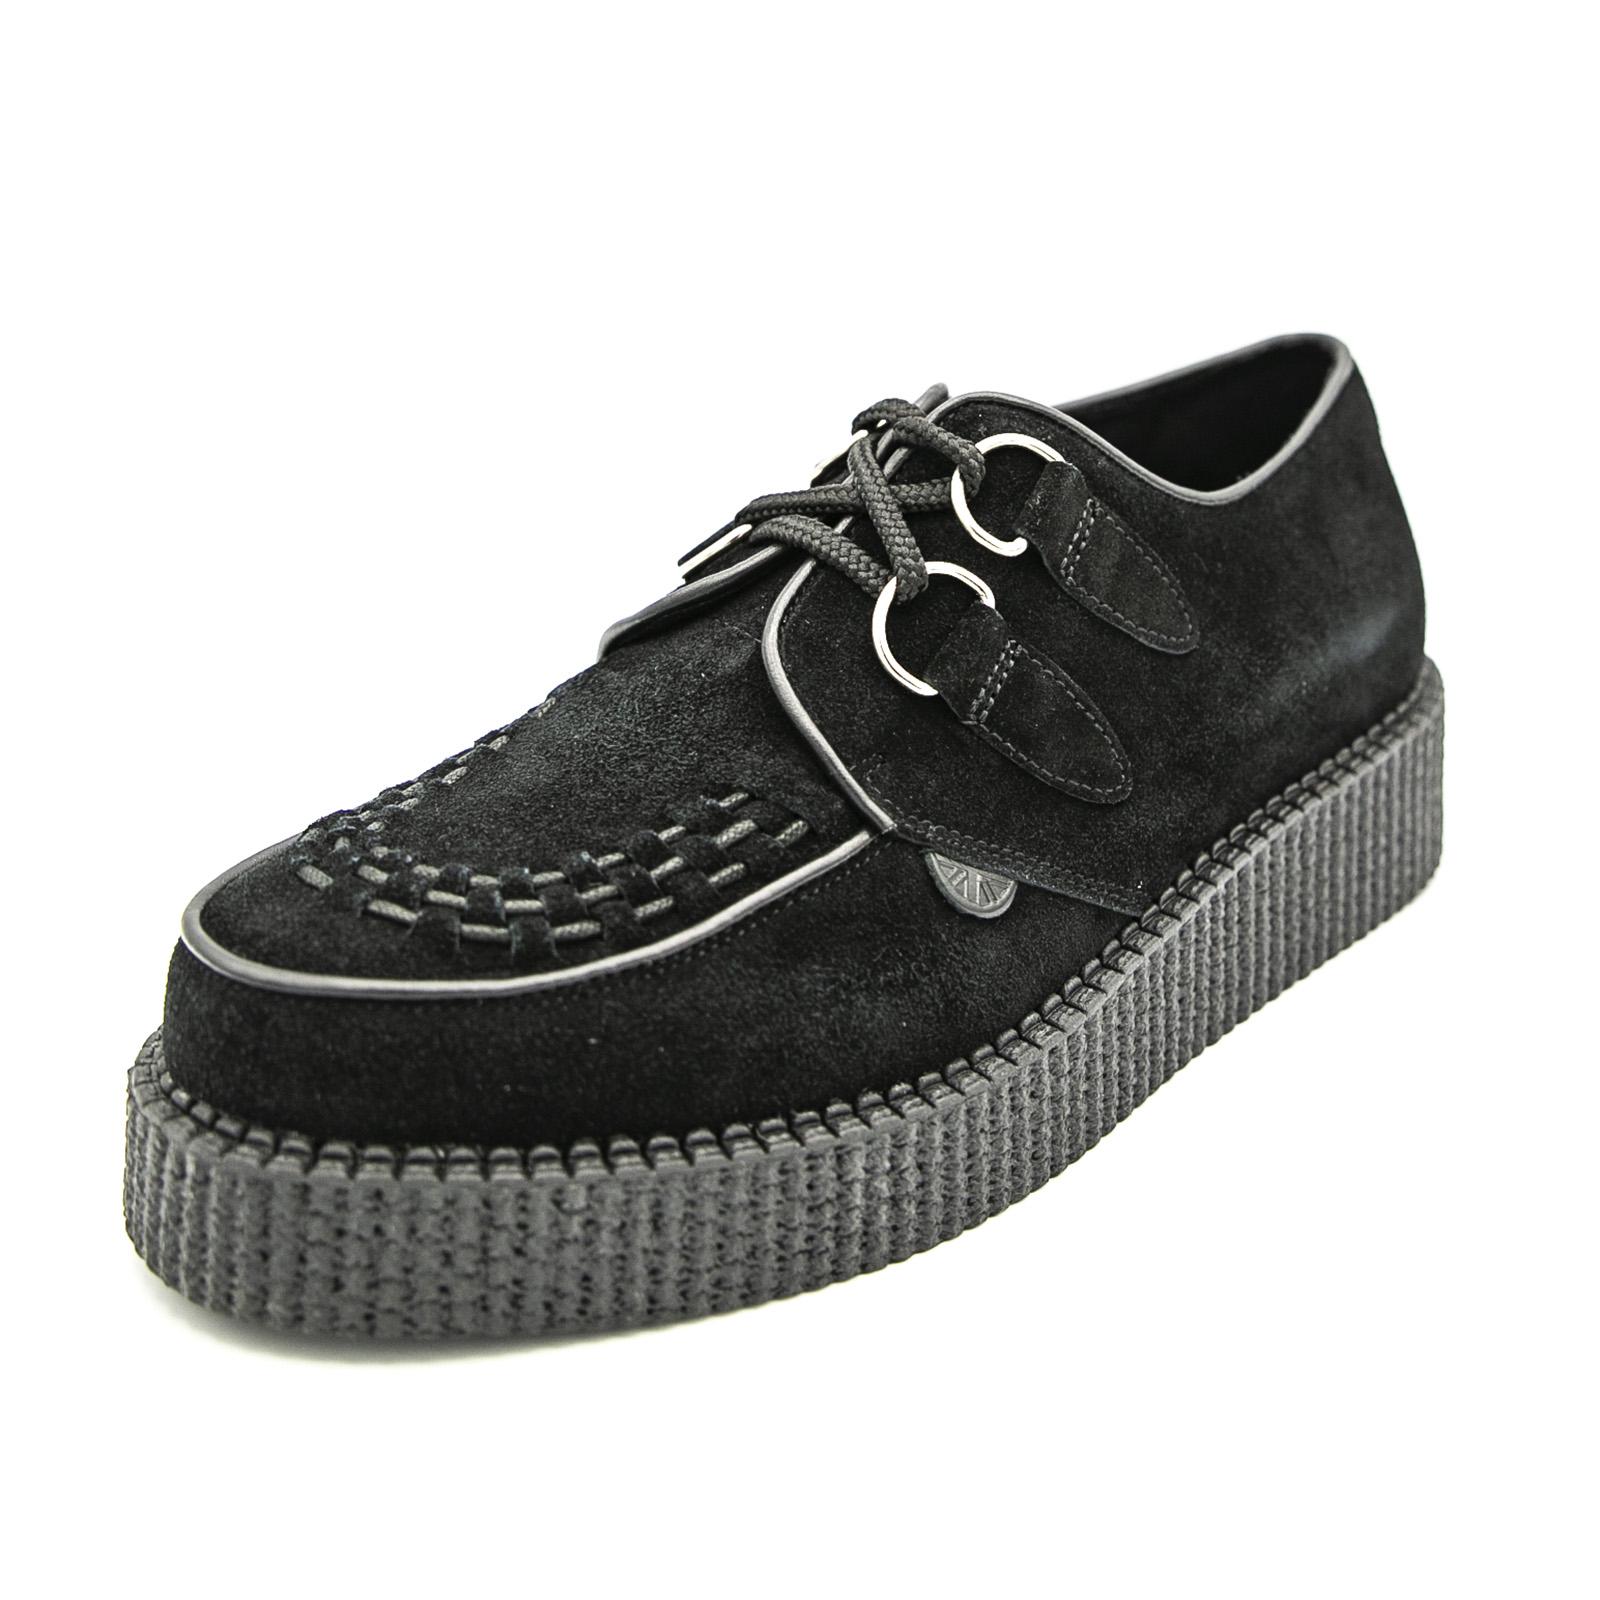 New York modelli alla moda metà prezzo Details about Underground Wulfrun - Black - Shoes Low Man/Women Black